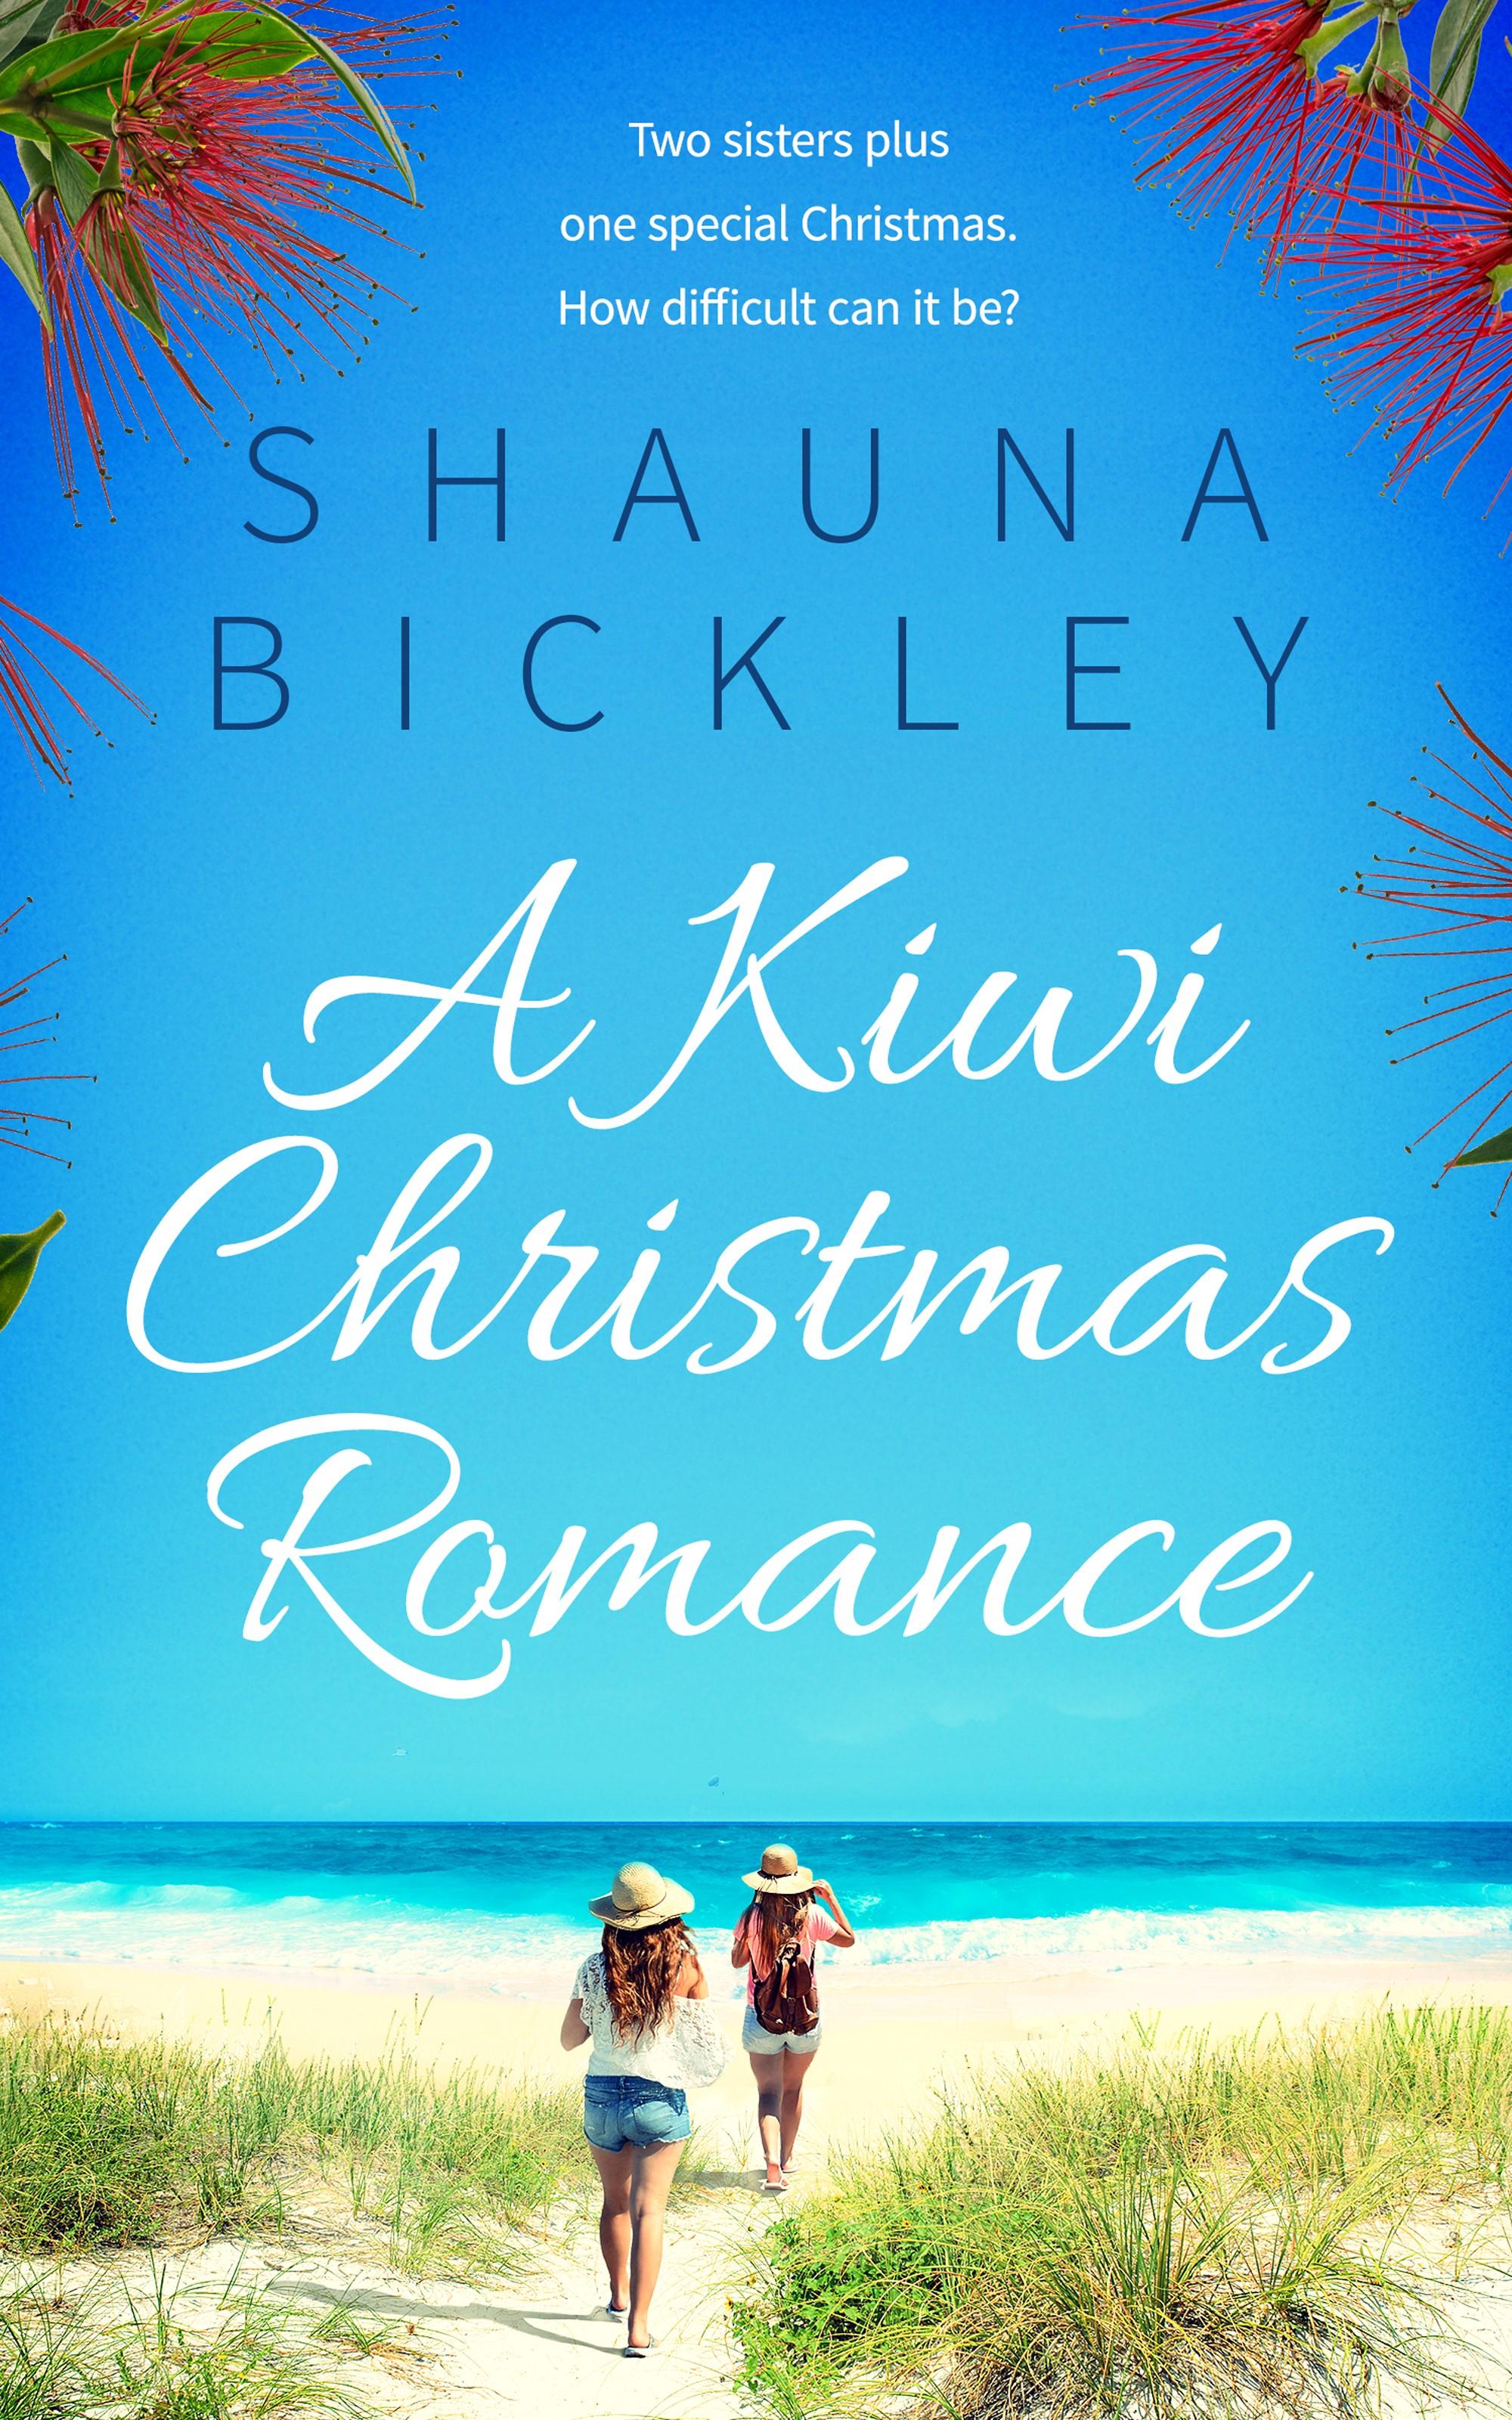 A Kiwi Christmas Romance